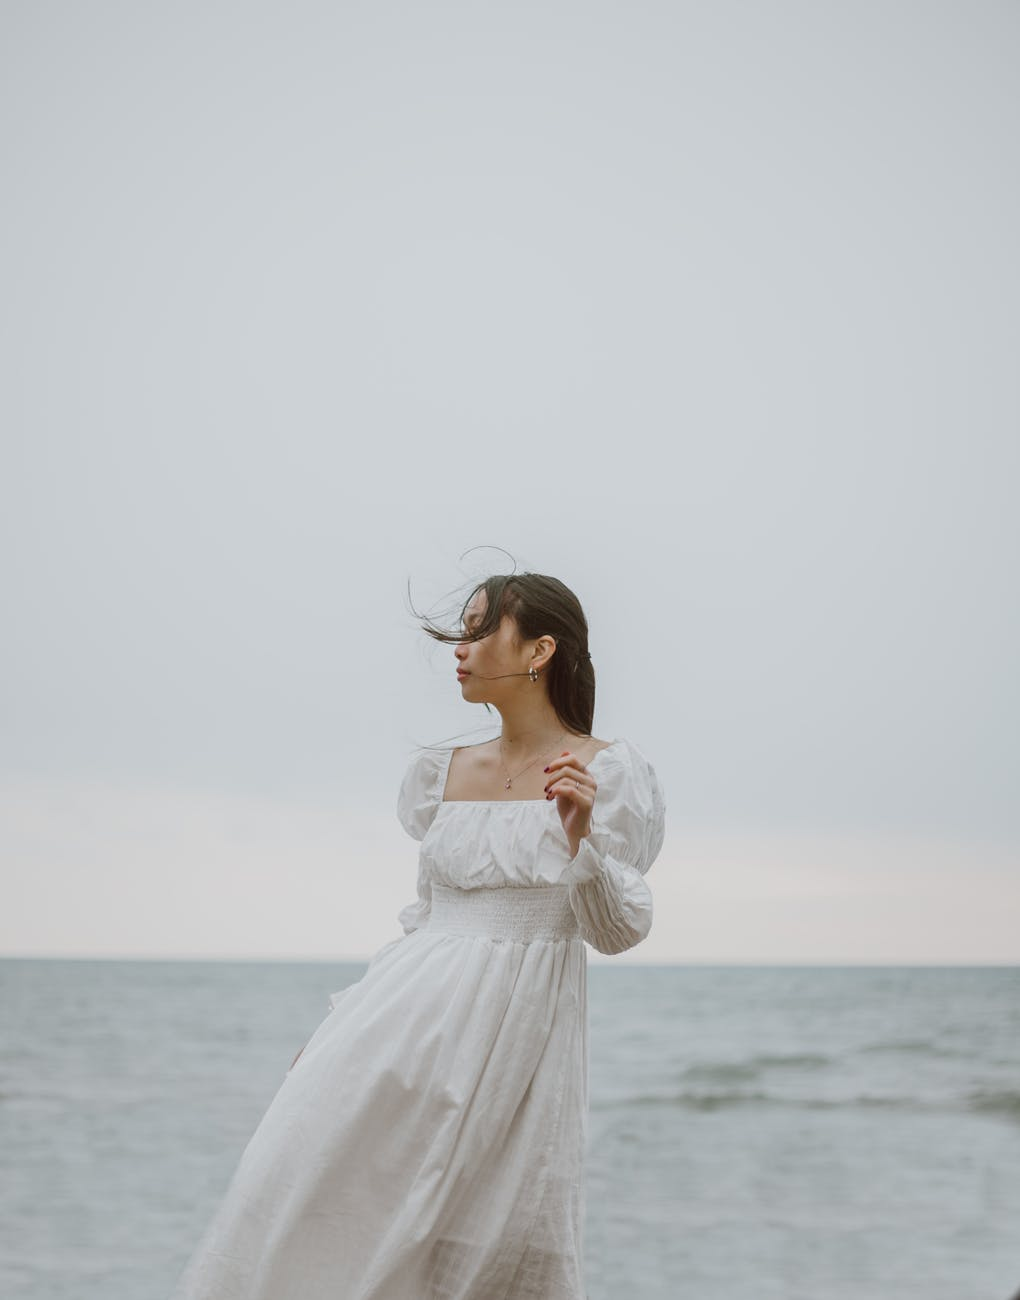 romantic asian traveler contemplating sea under light sky